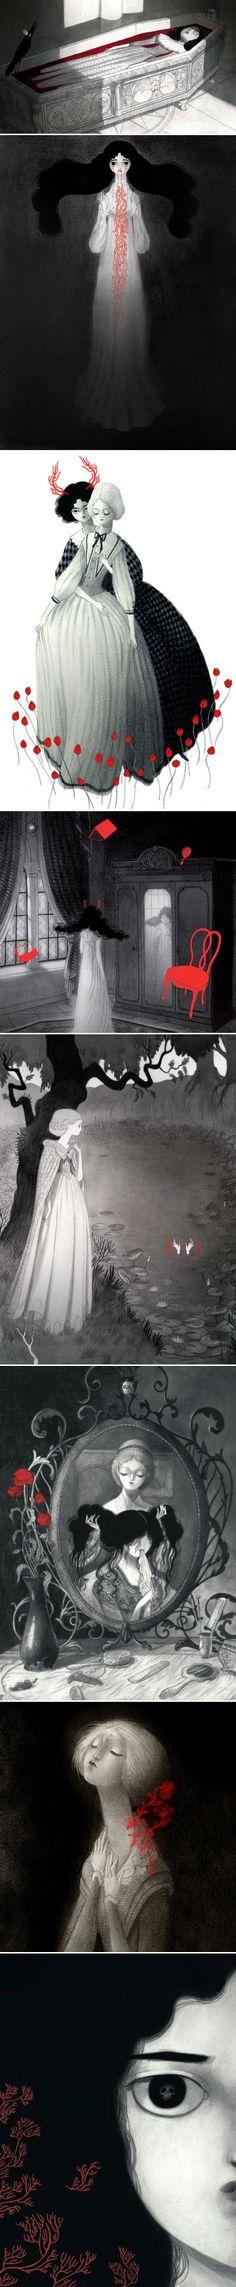 Isabella Mazanti's illustrations for Sheridan Le Fanu's Carmilla